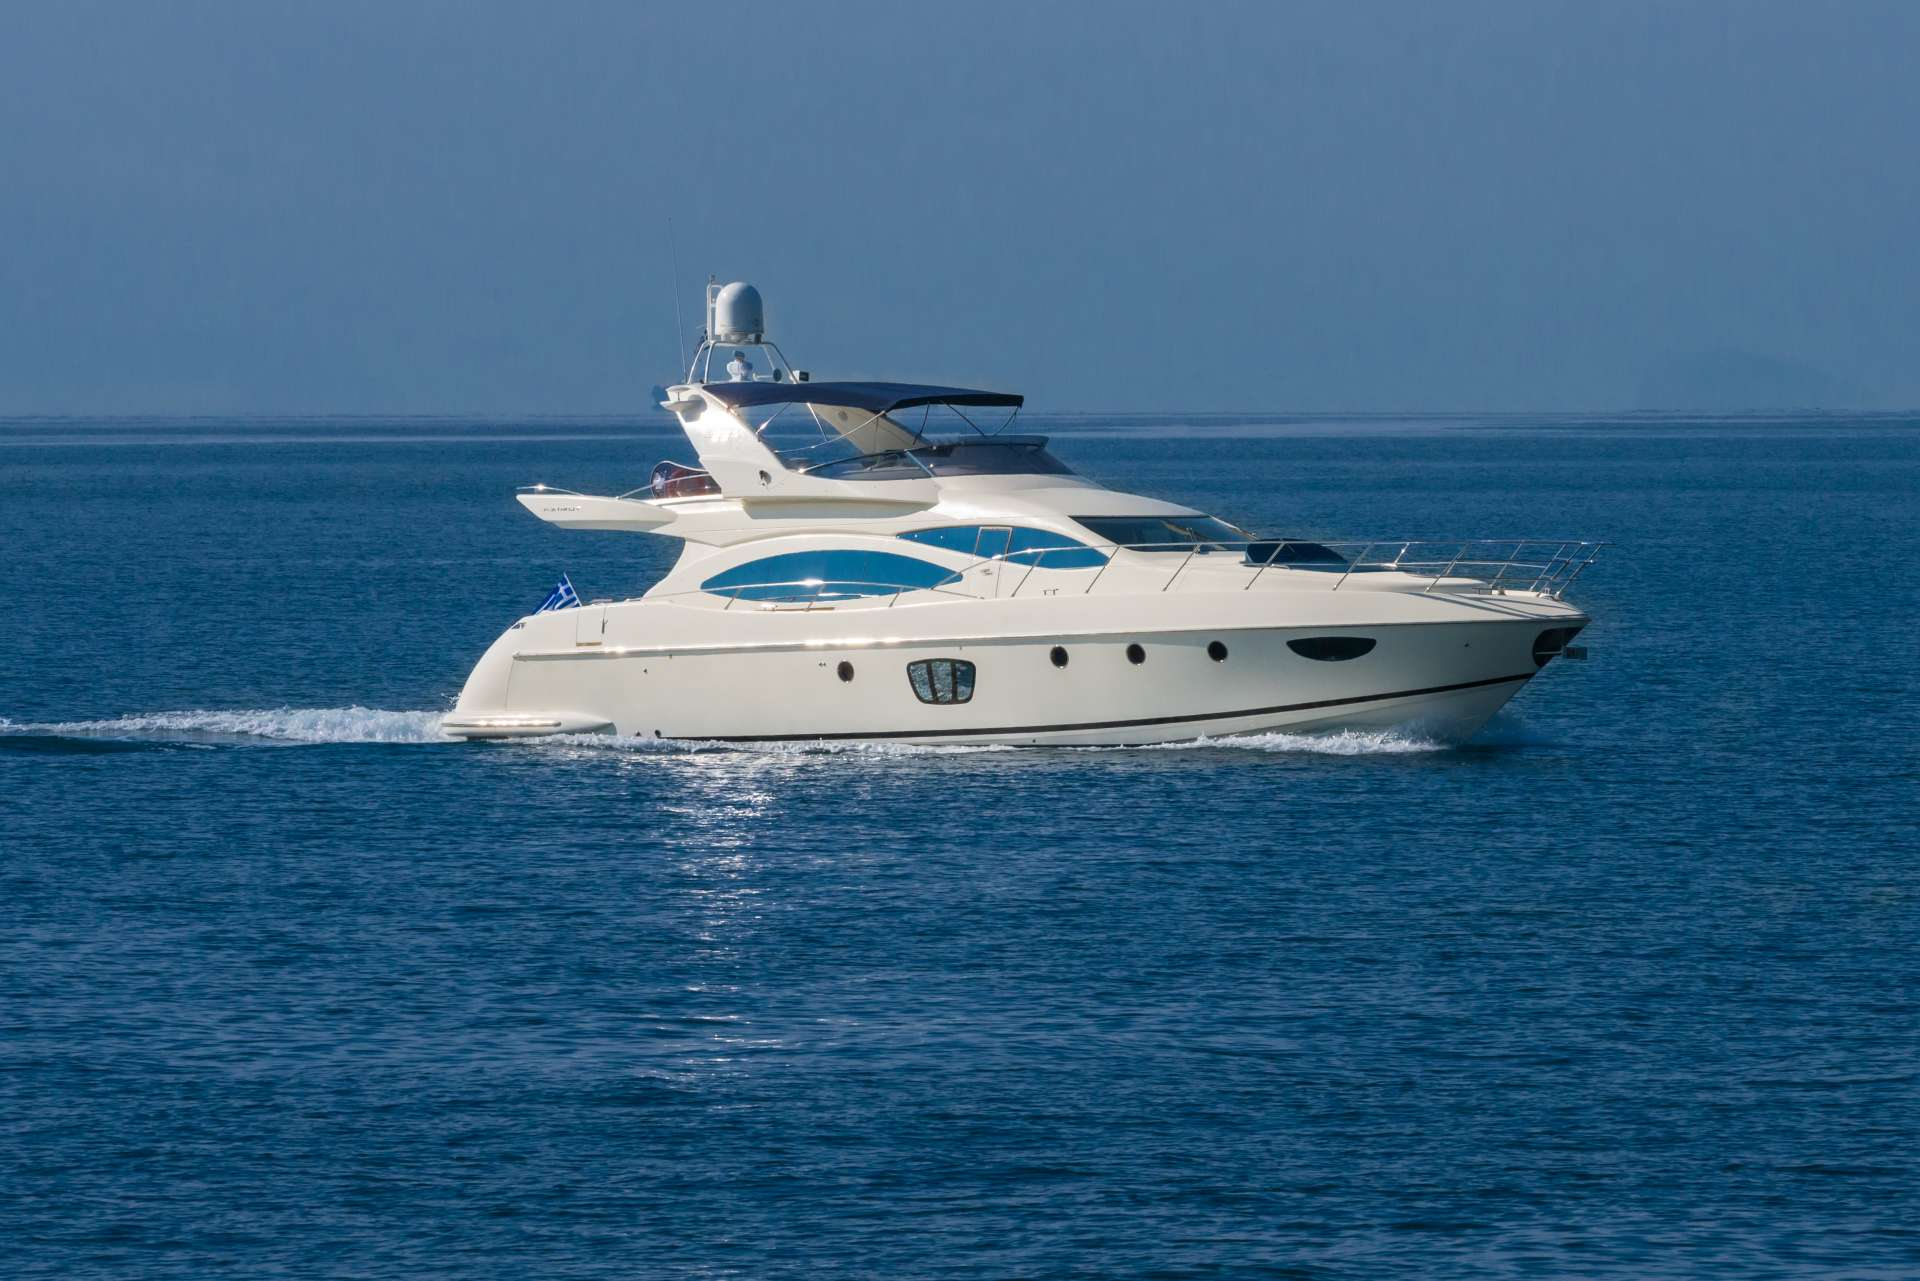 Main image of ALMAZ yacht